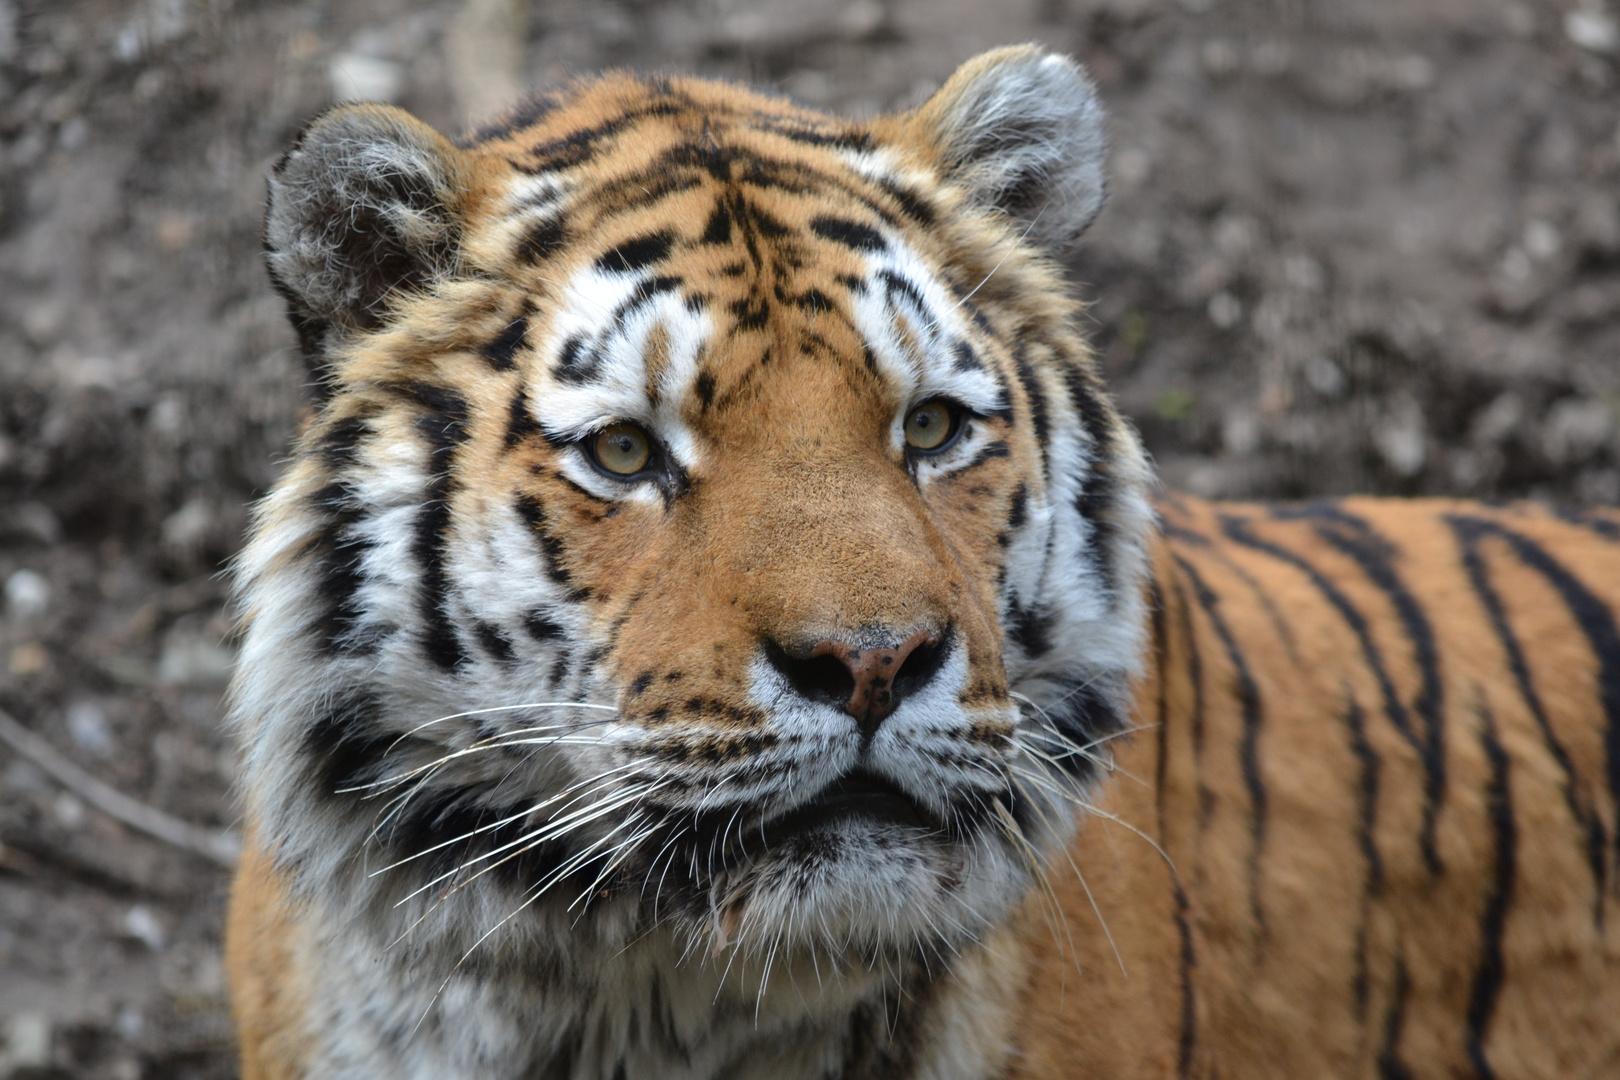 Tigeraugen